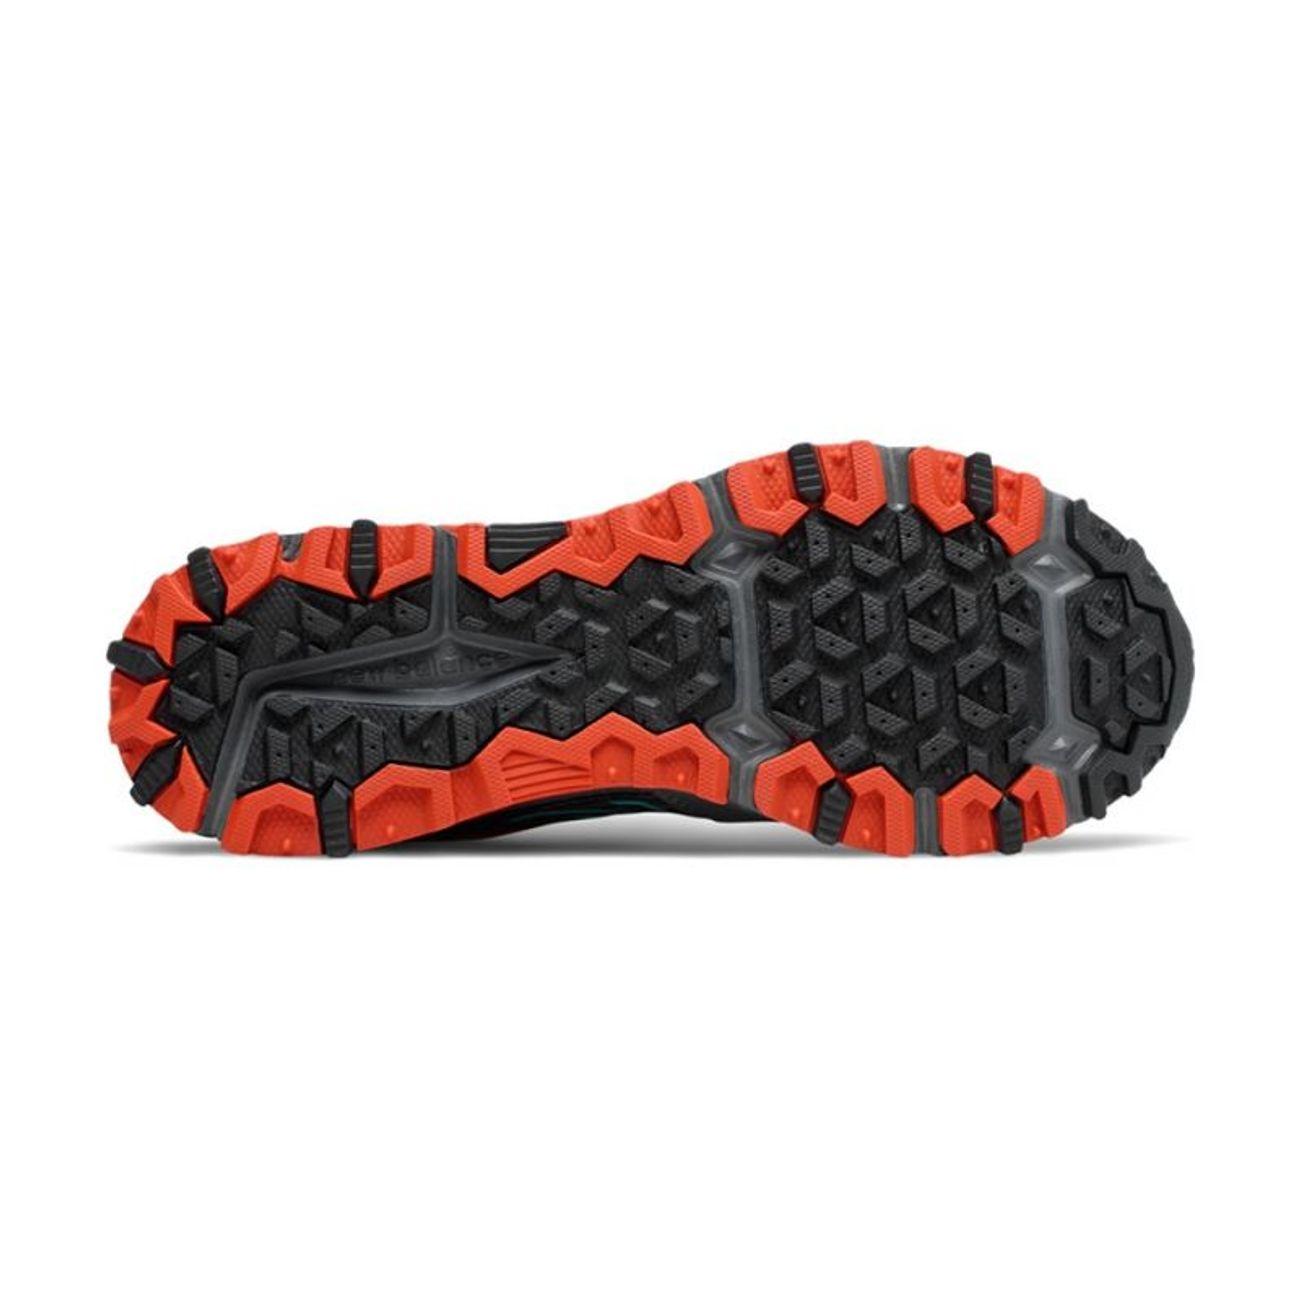 Trail homme NEW BALANCE Chaussures de Running Grises Homme New Balance MT410 D